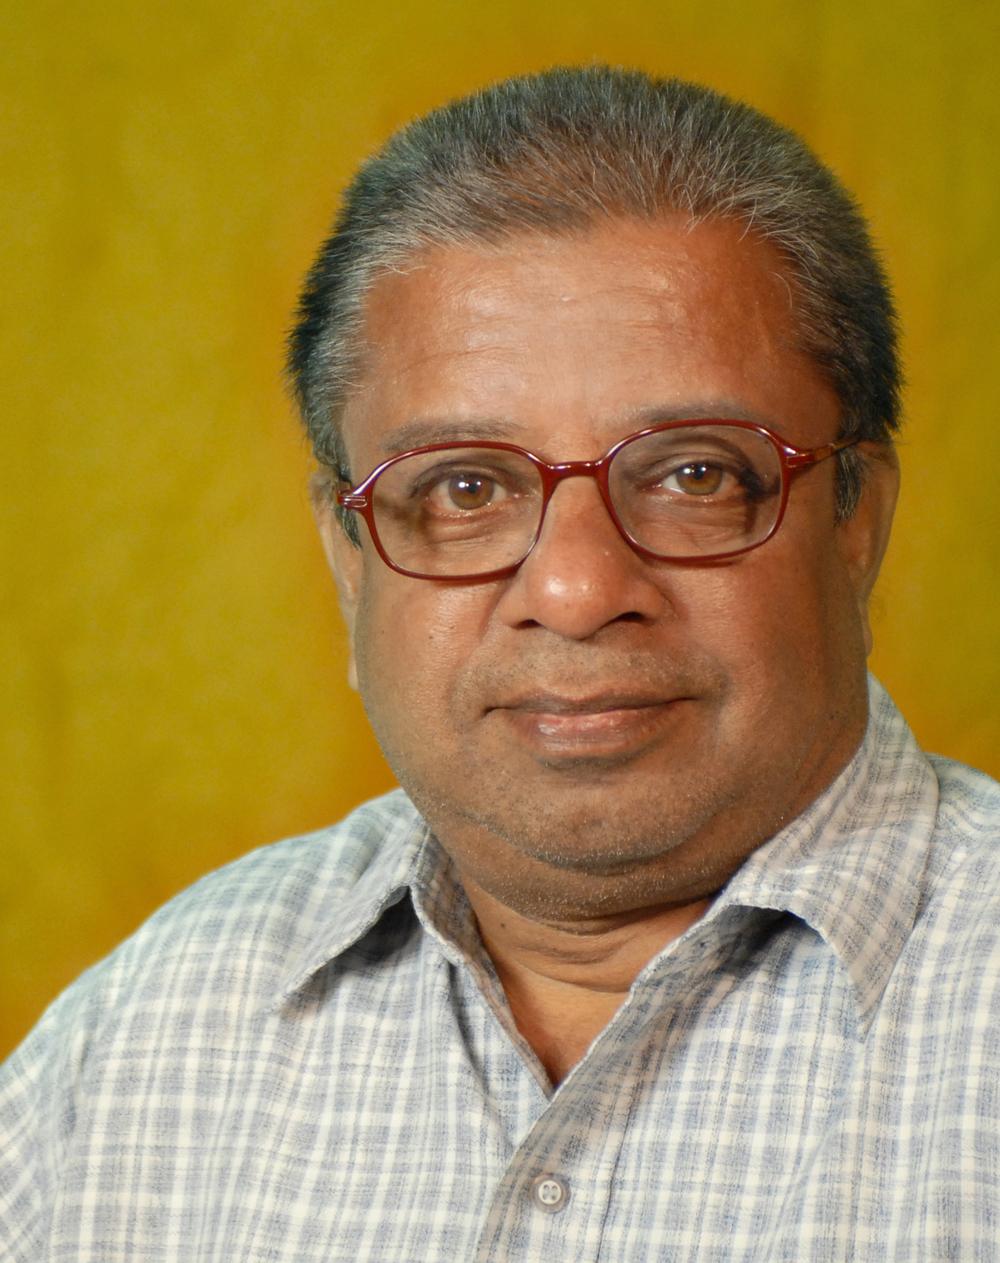 Bhaskara S. Narayanan (Music Composer)